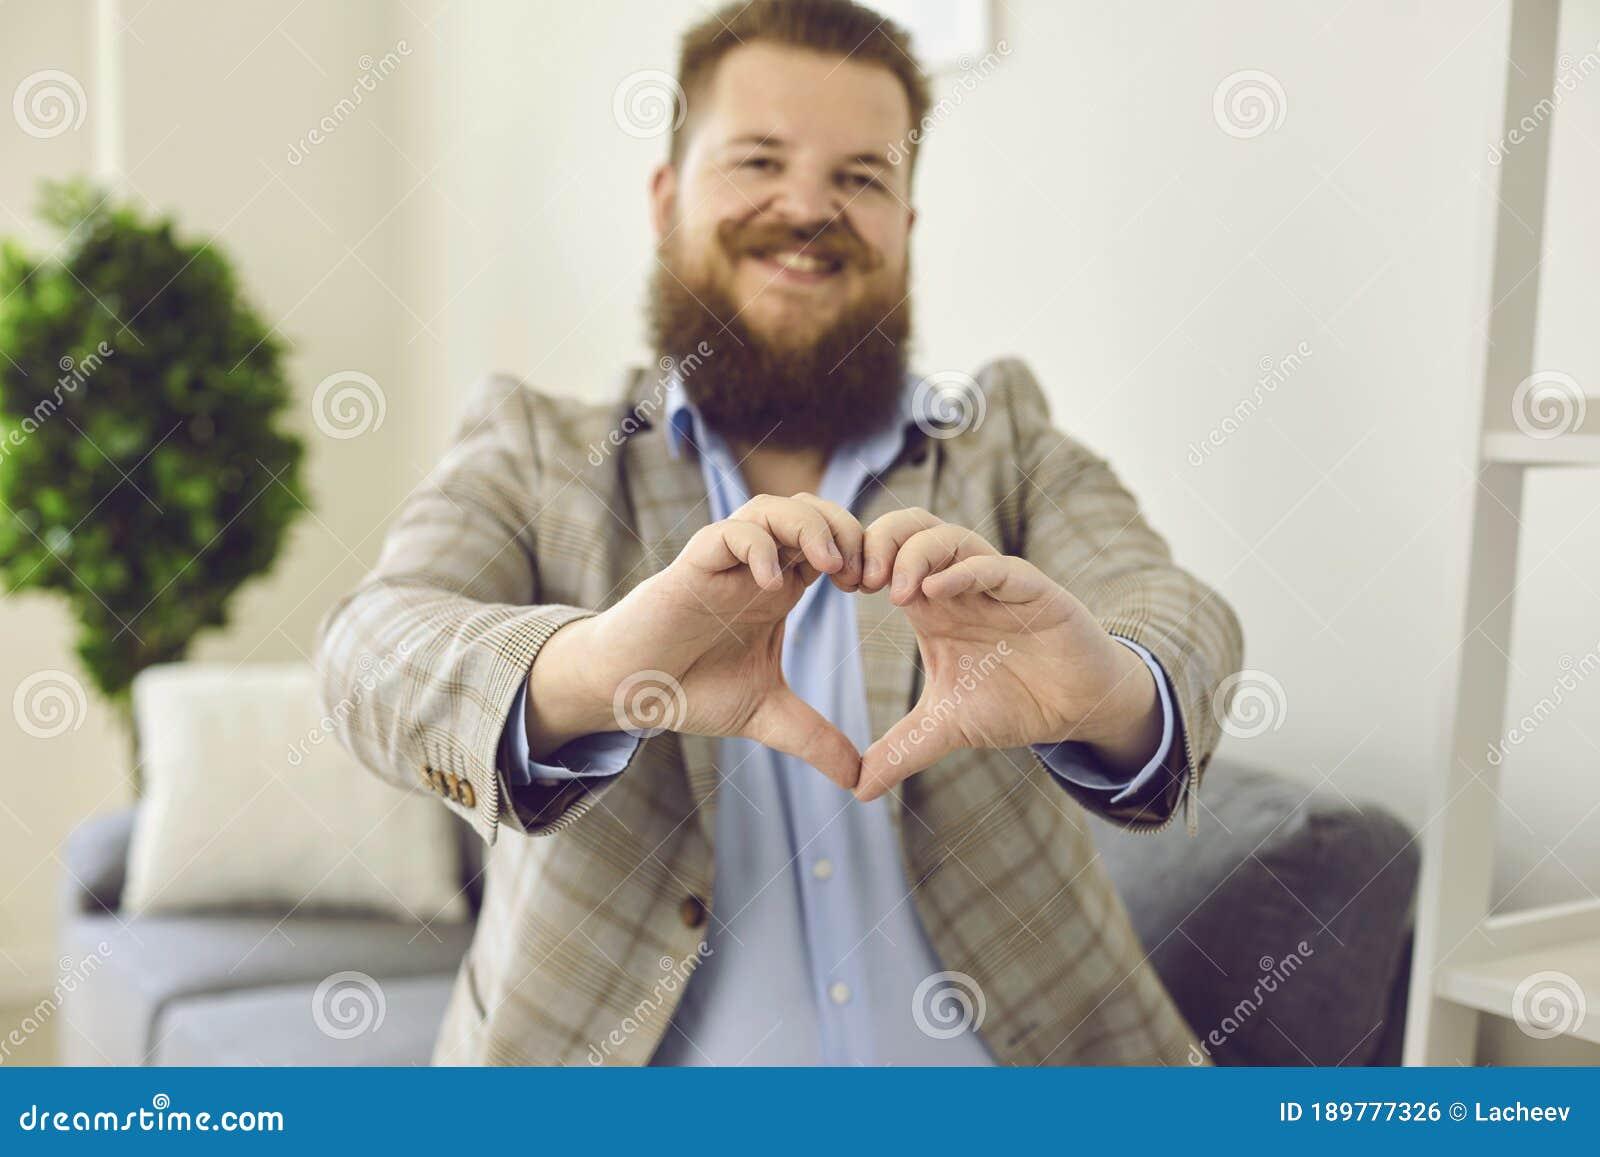 beard online dating